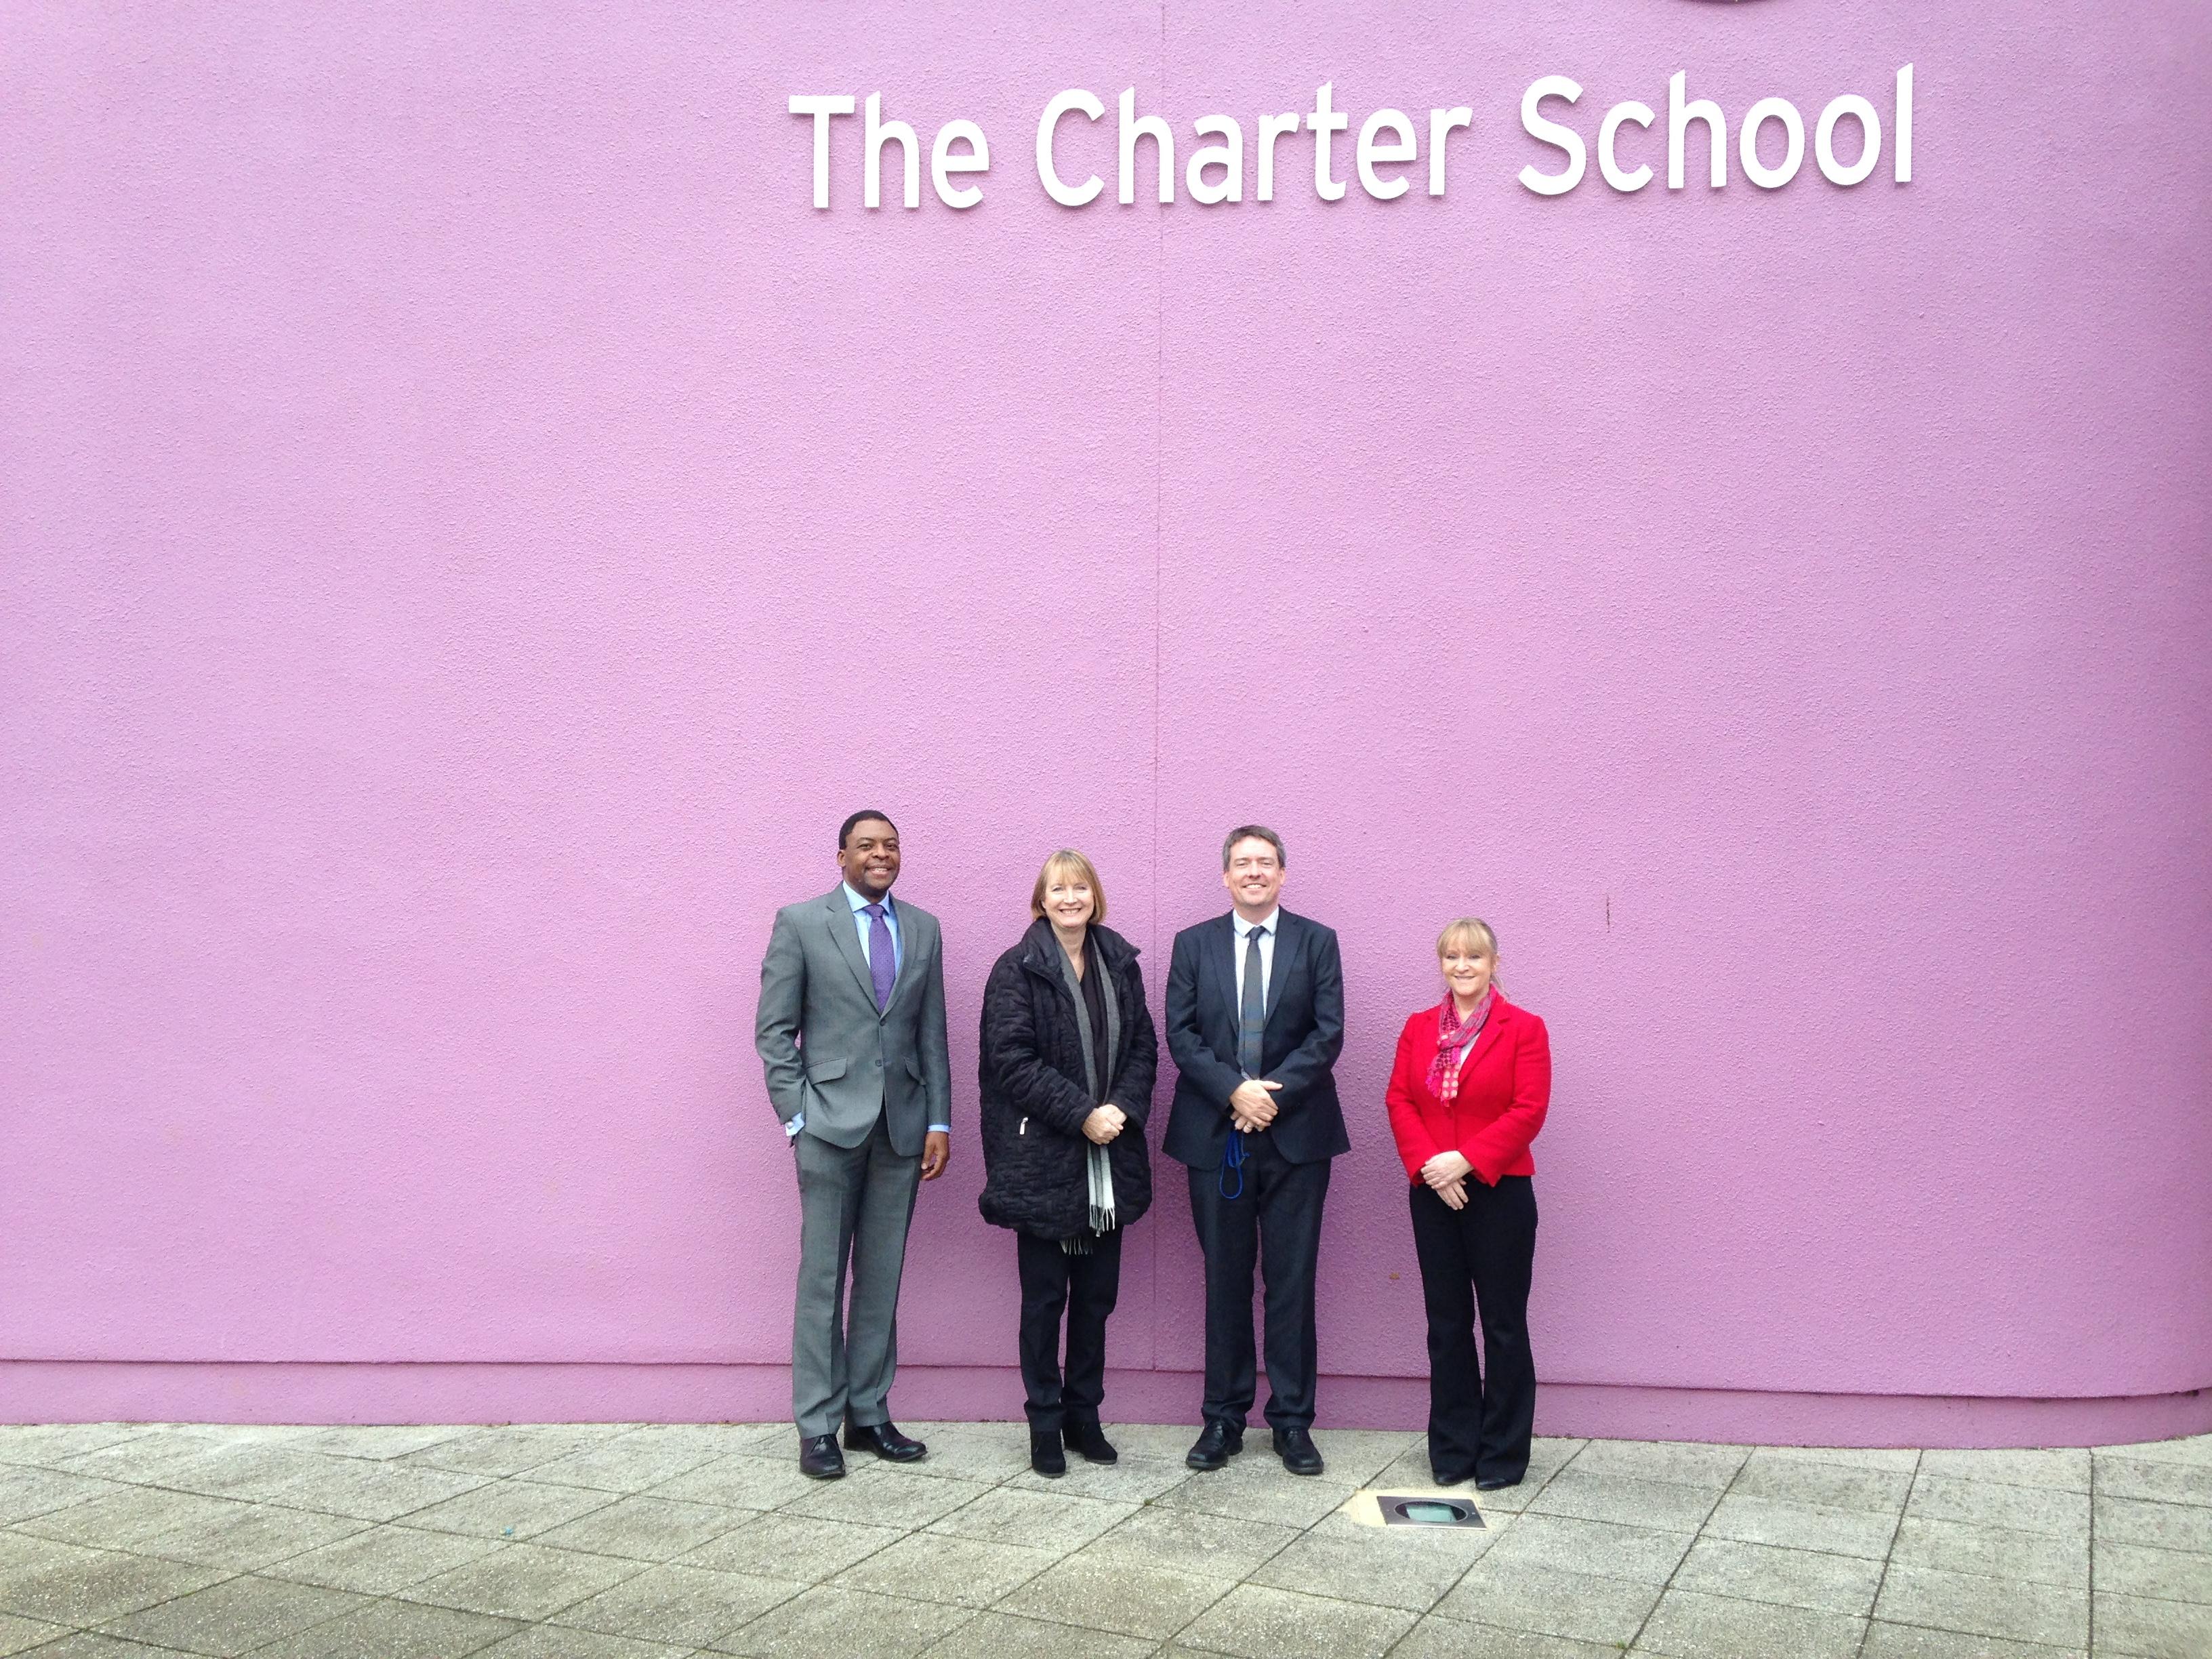 Charter_School2_19.11.14.jpg